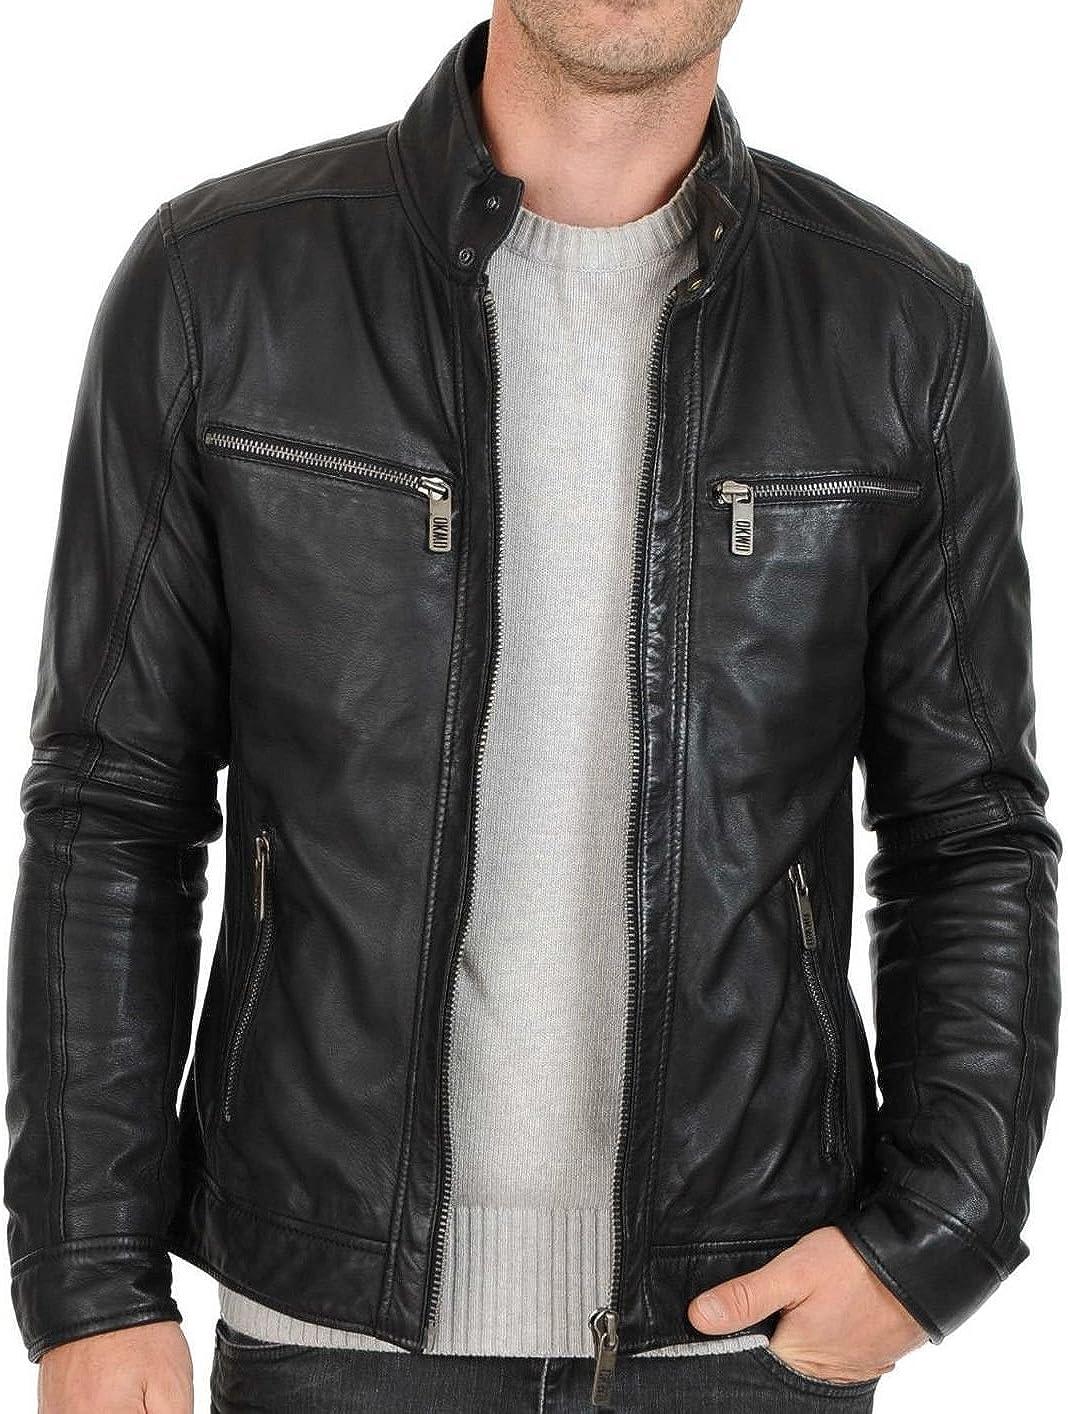 MARIYAM Leather Store Mens Jacket Black Slim Biker Beauty products Motorcy Fit